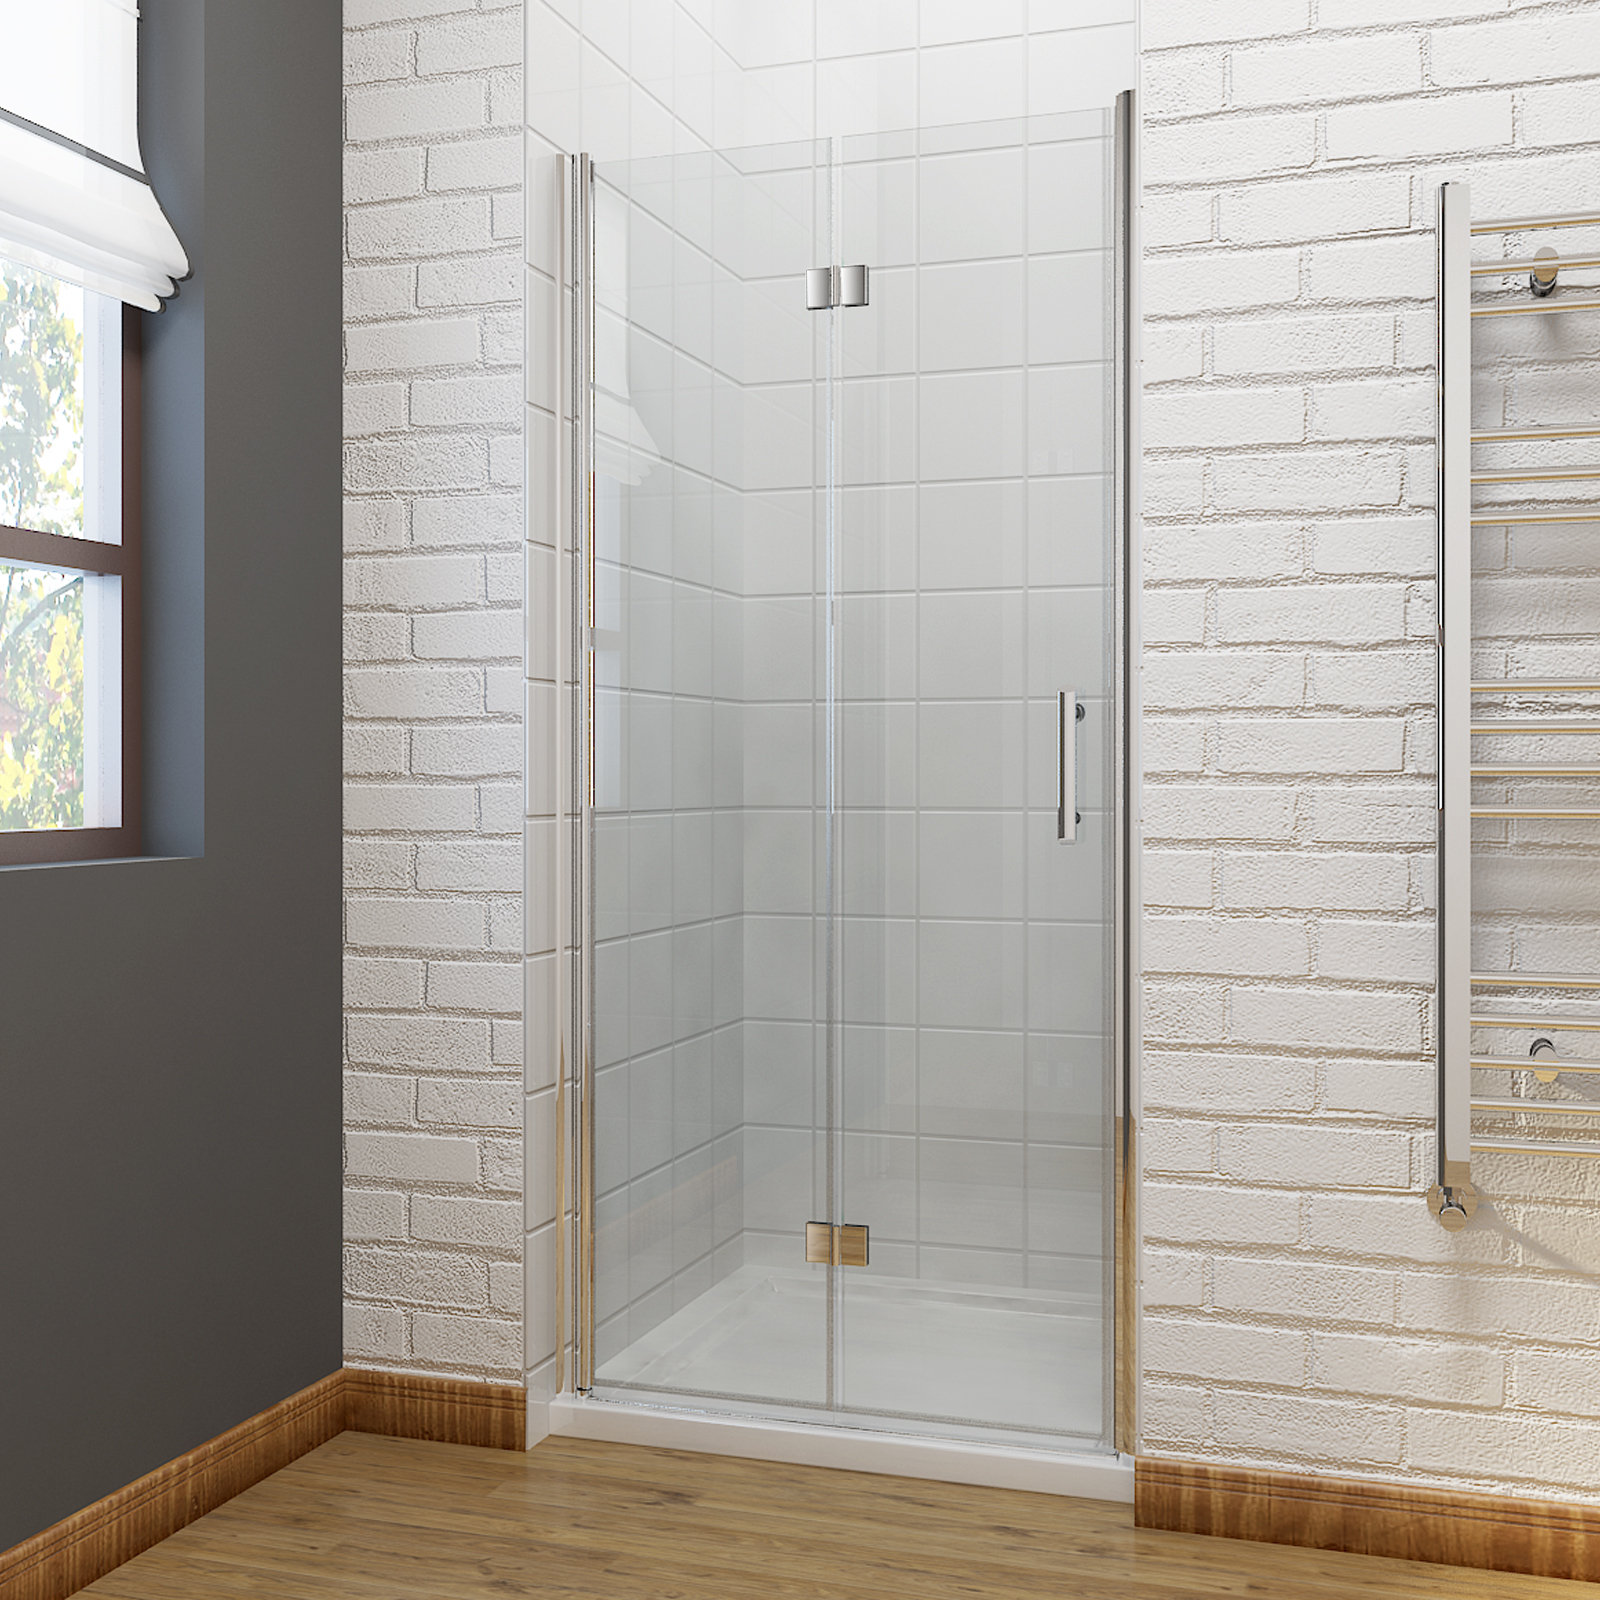 Frameless bifold shower door enclosure 6mm glass screen for 1000 bi fold shower door